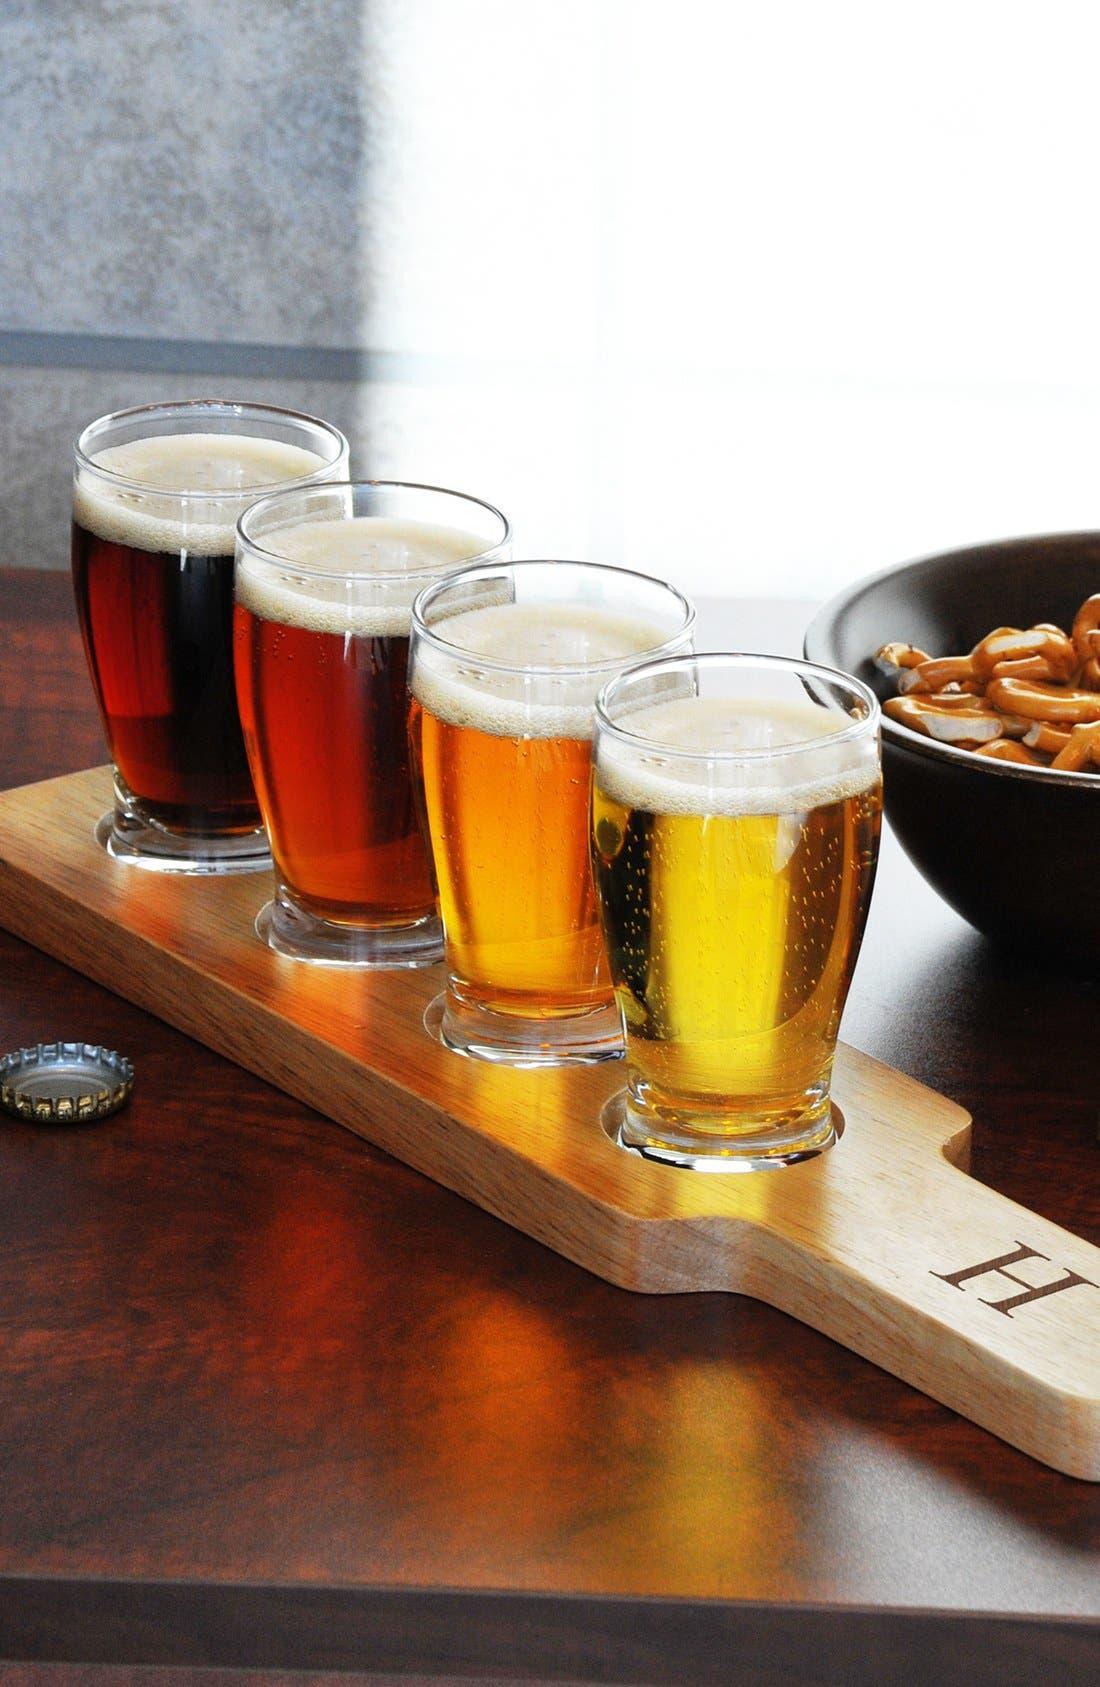 CATHY'S CONCEPTS Monogram Beer Flight Sampler Set